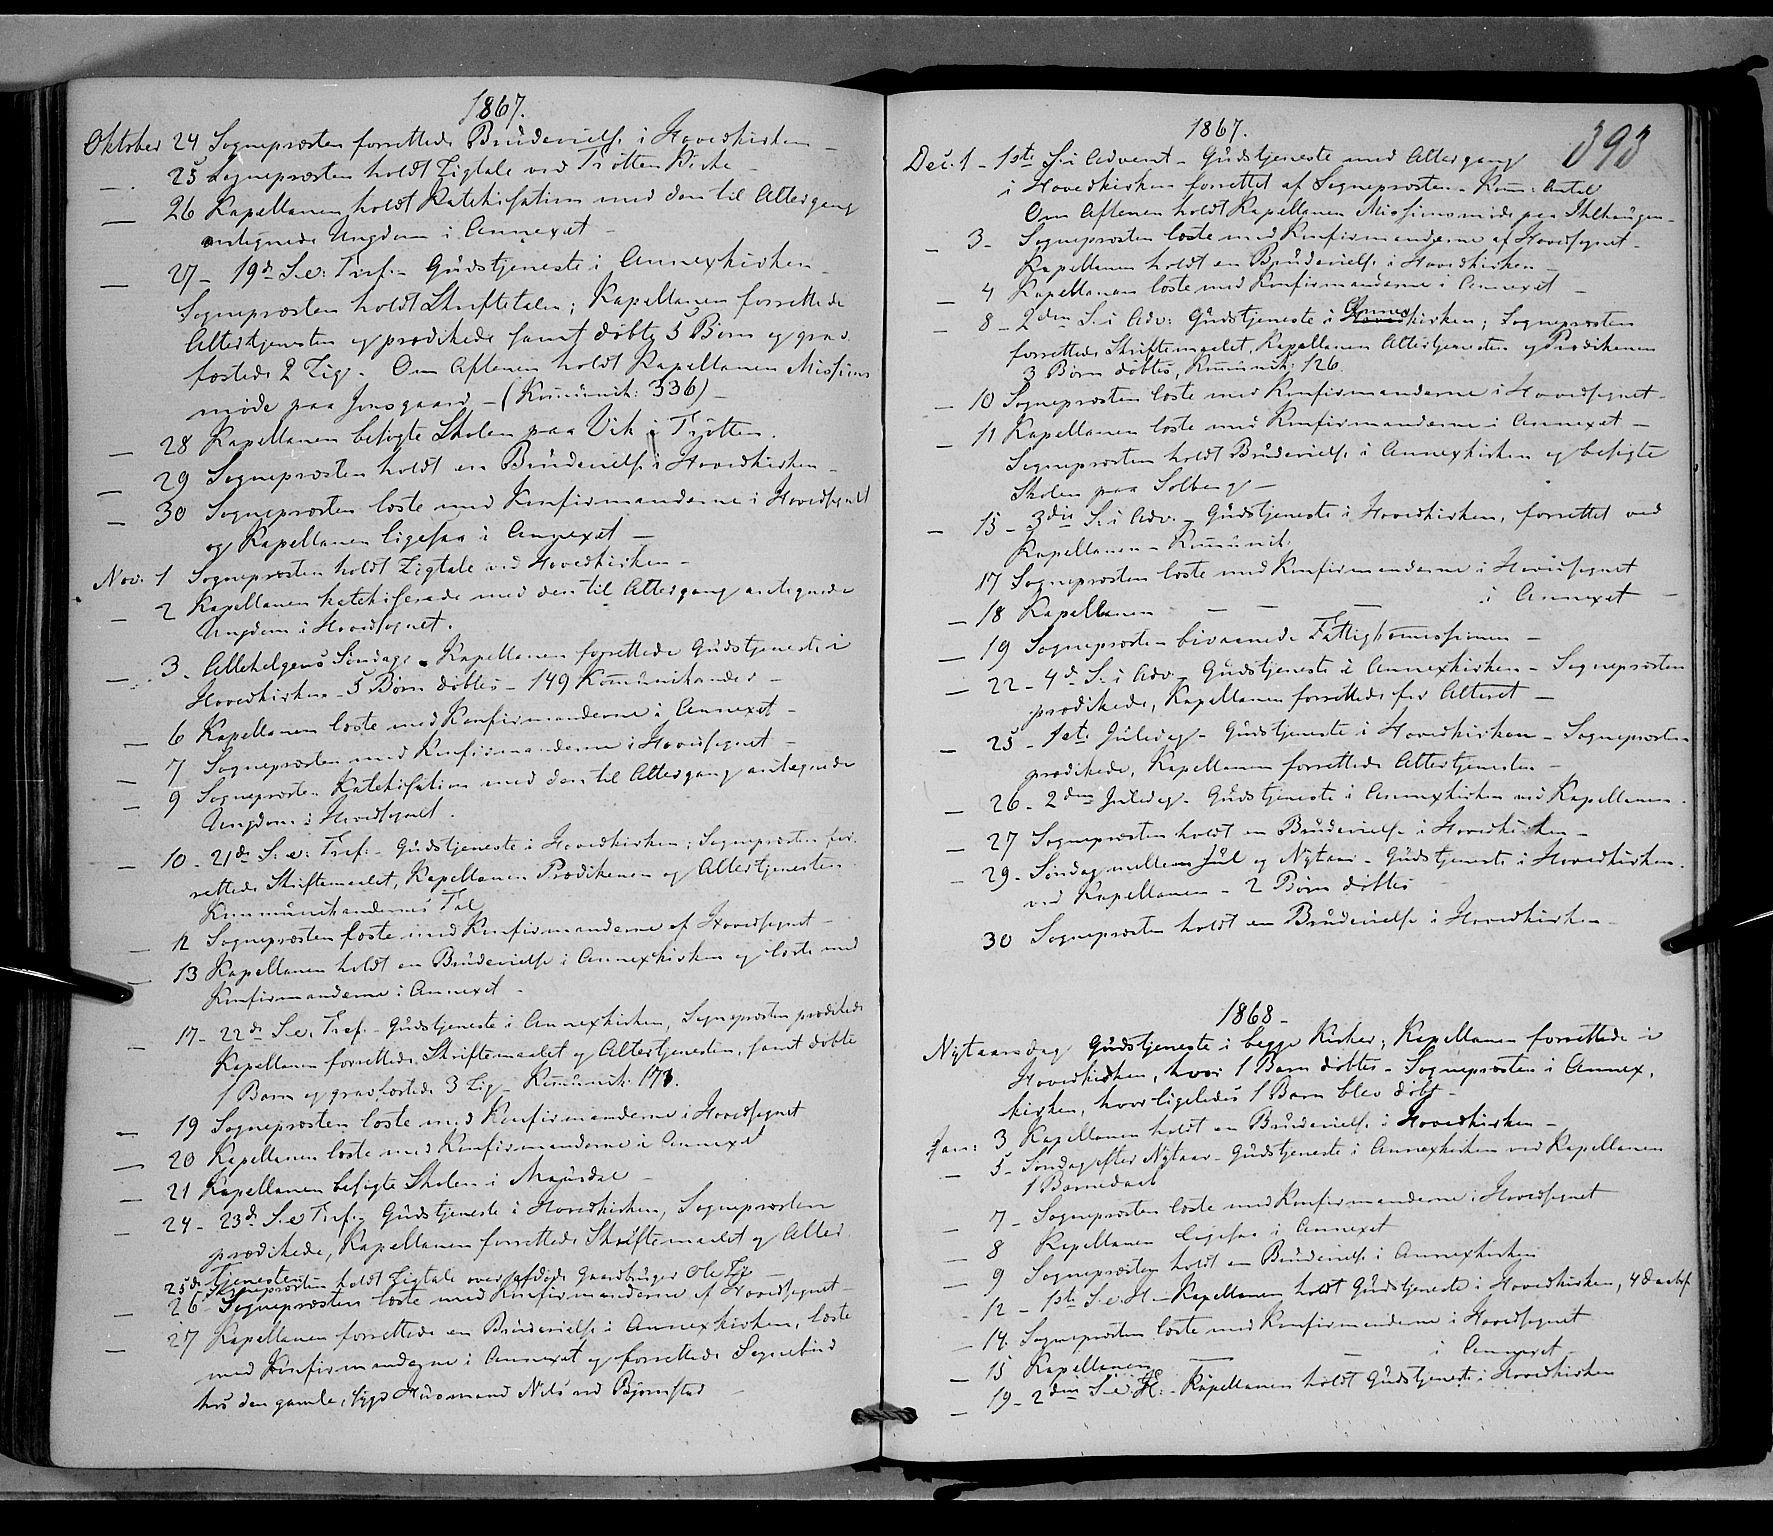 SAH, Øyer prestekontor, Ministerialbok nr. 6, 1858-1874, s. 393